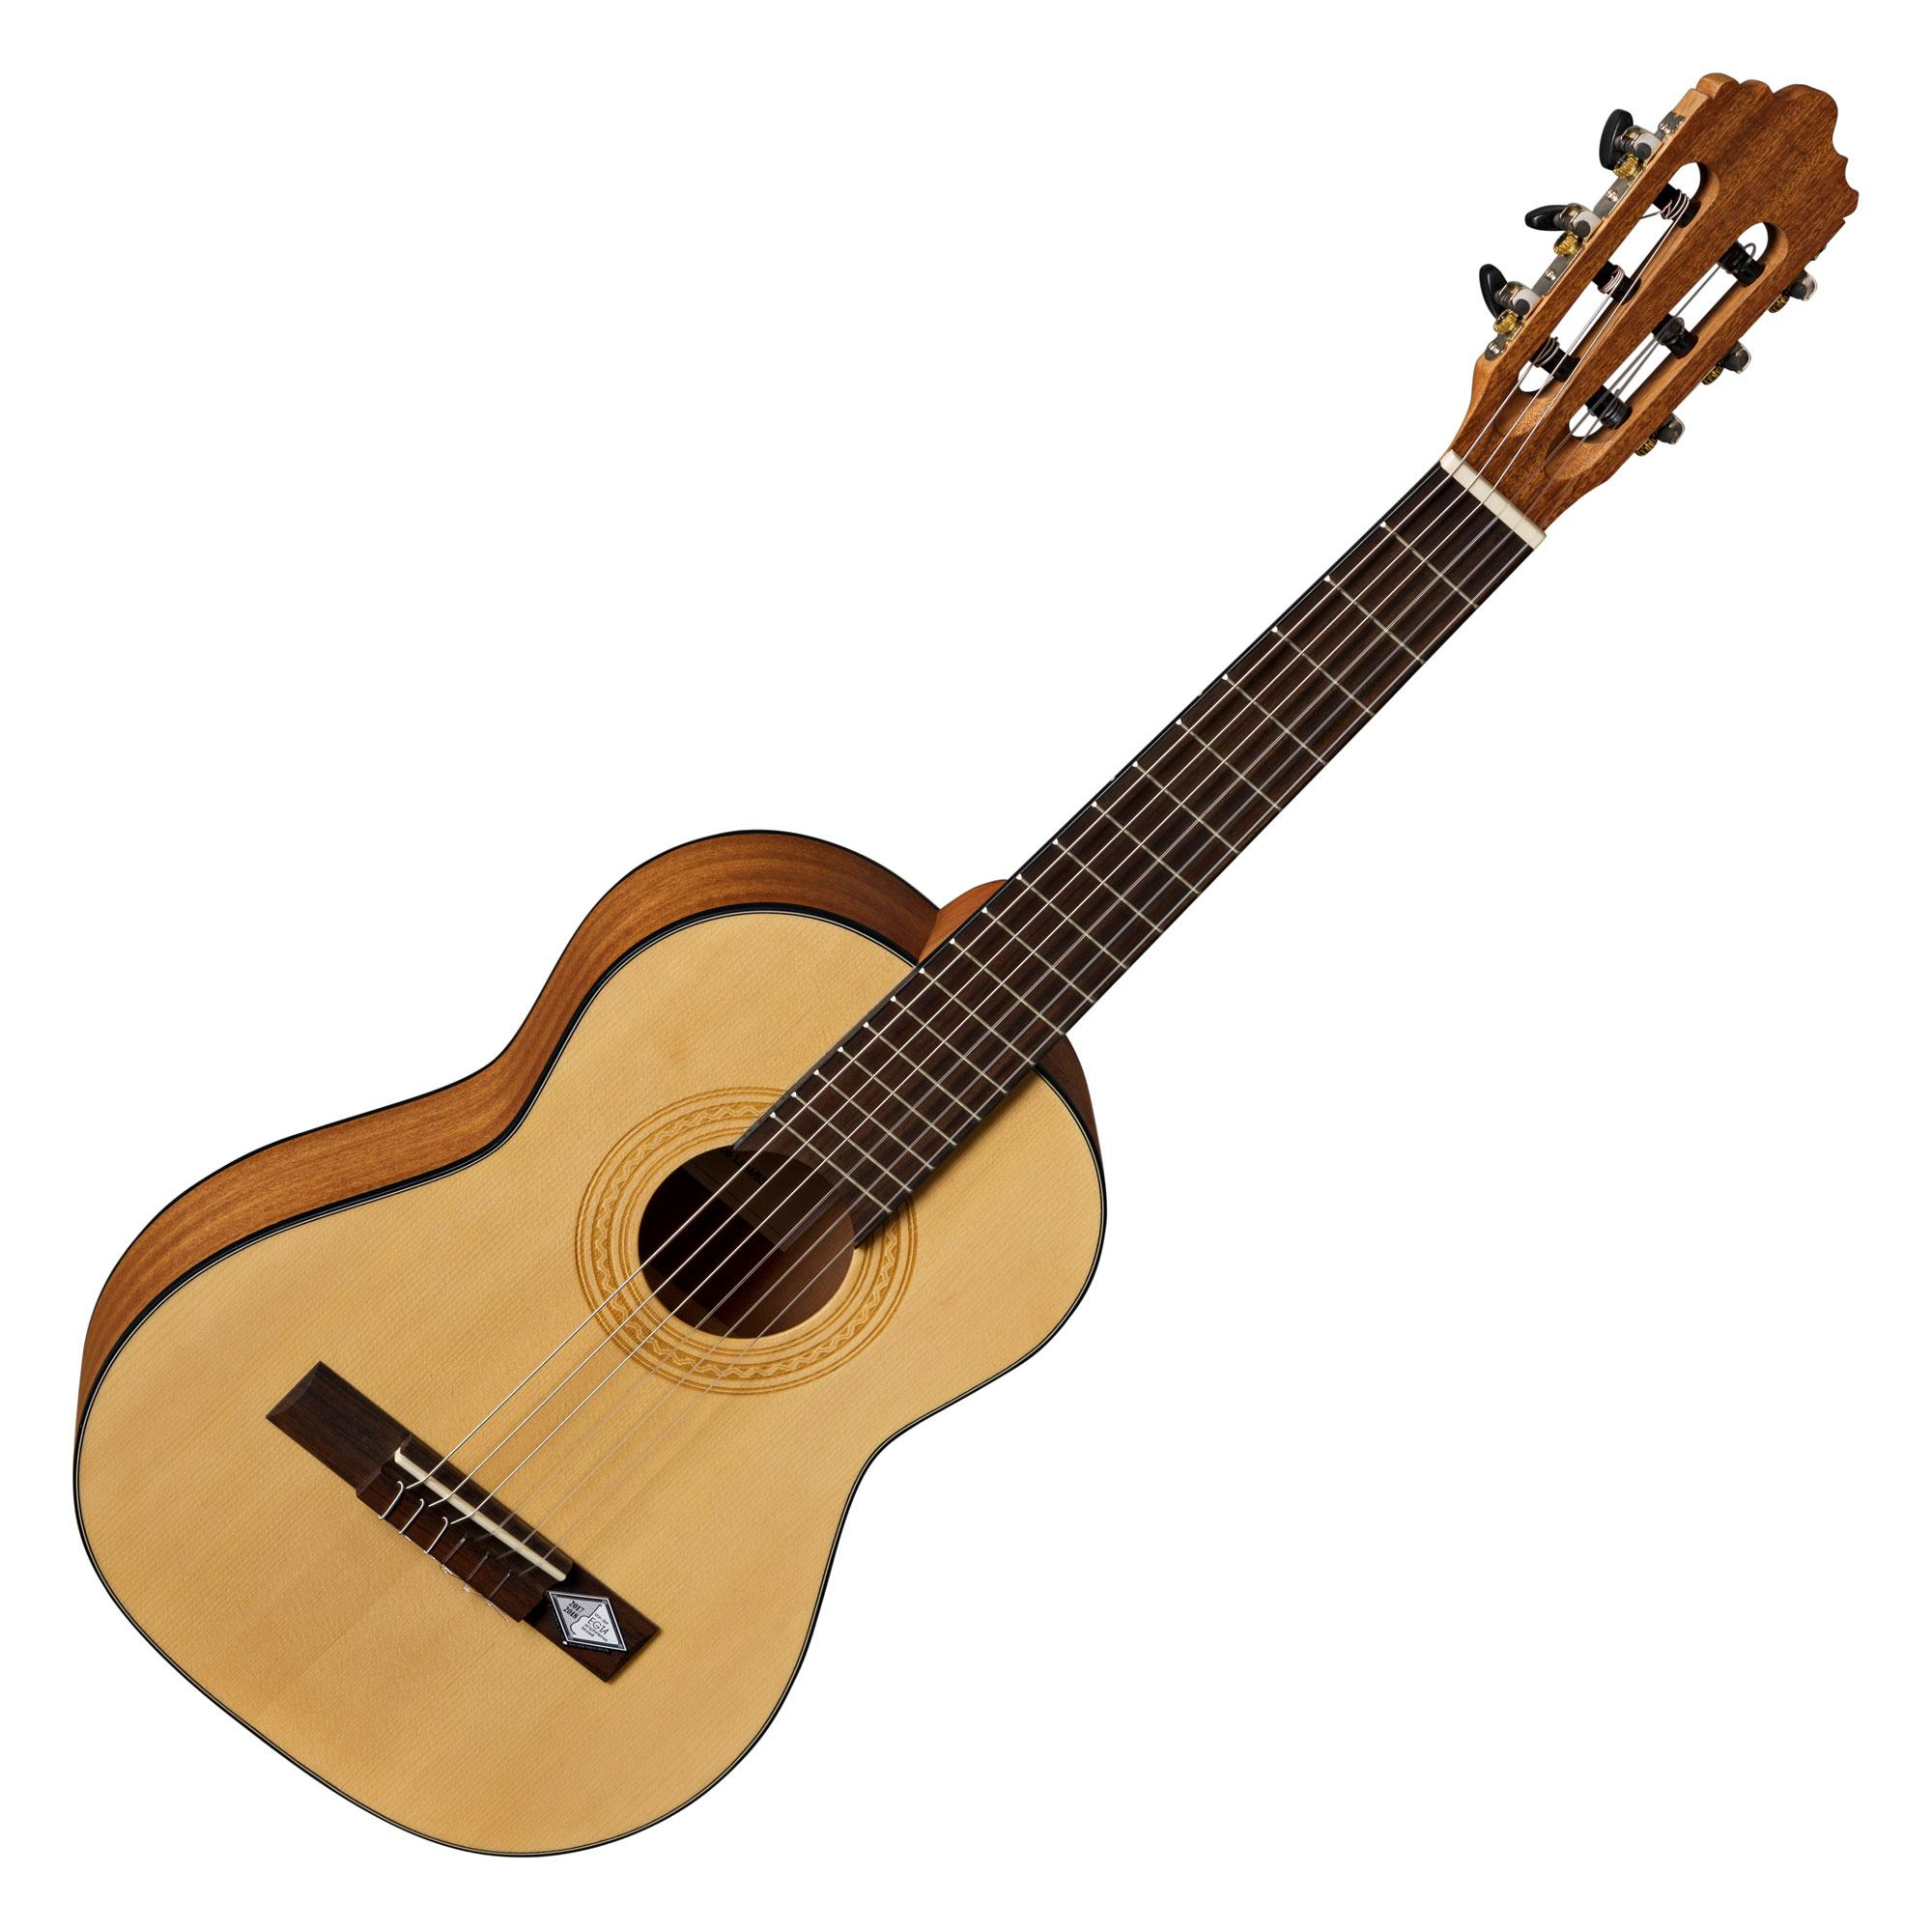 La Mancha Rubinito lsm 53 1 2 Konzertgitarre